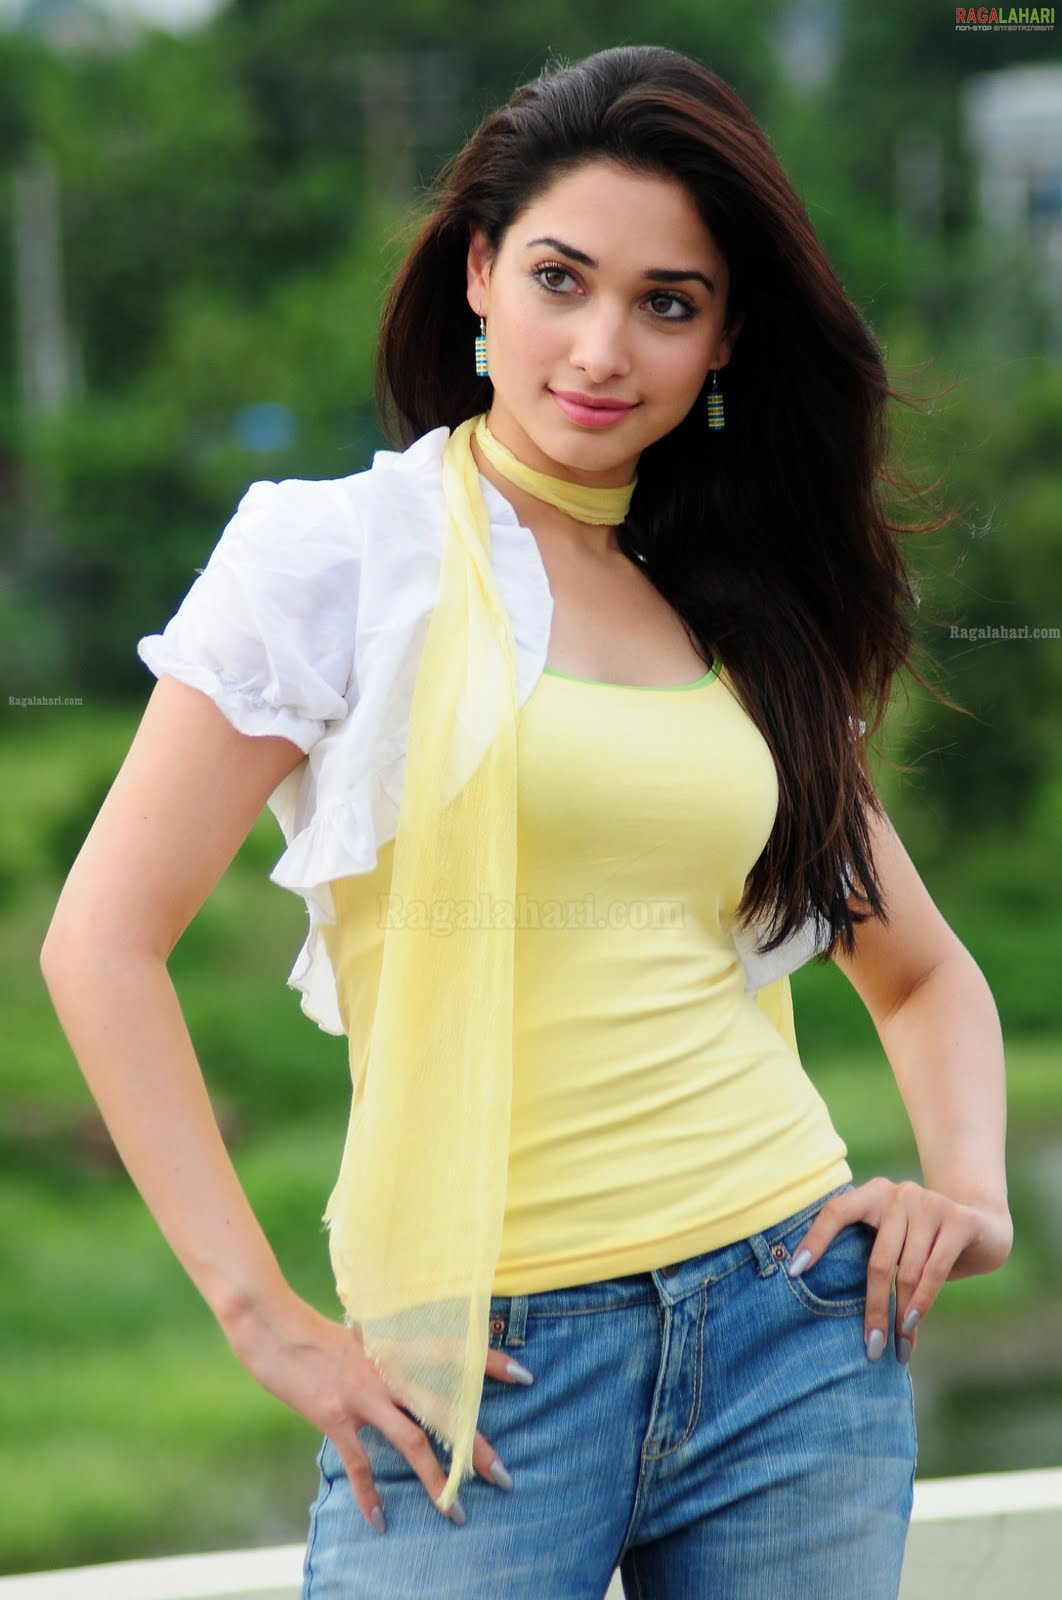 Tamanna Latest: Aishwarya Rai Hot: Tamanna Bhatia In Jeans